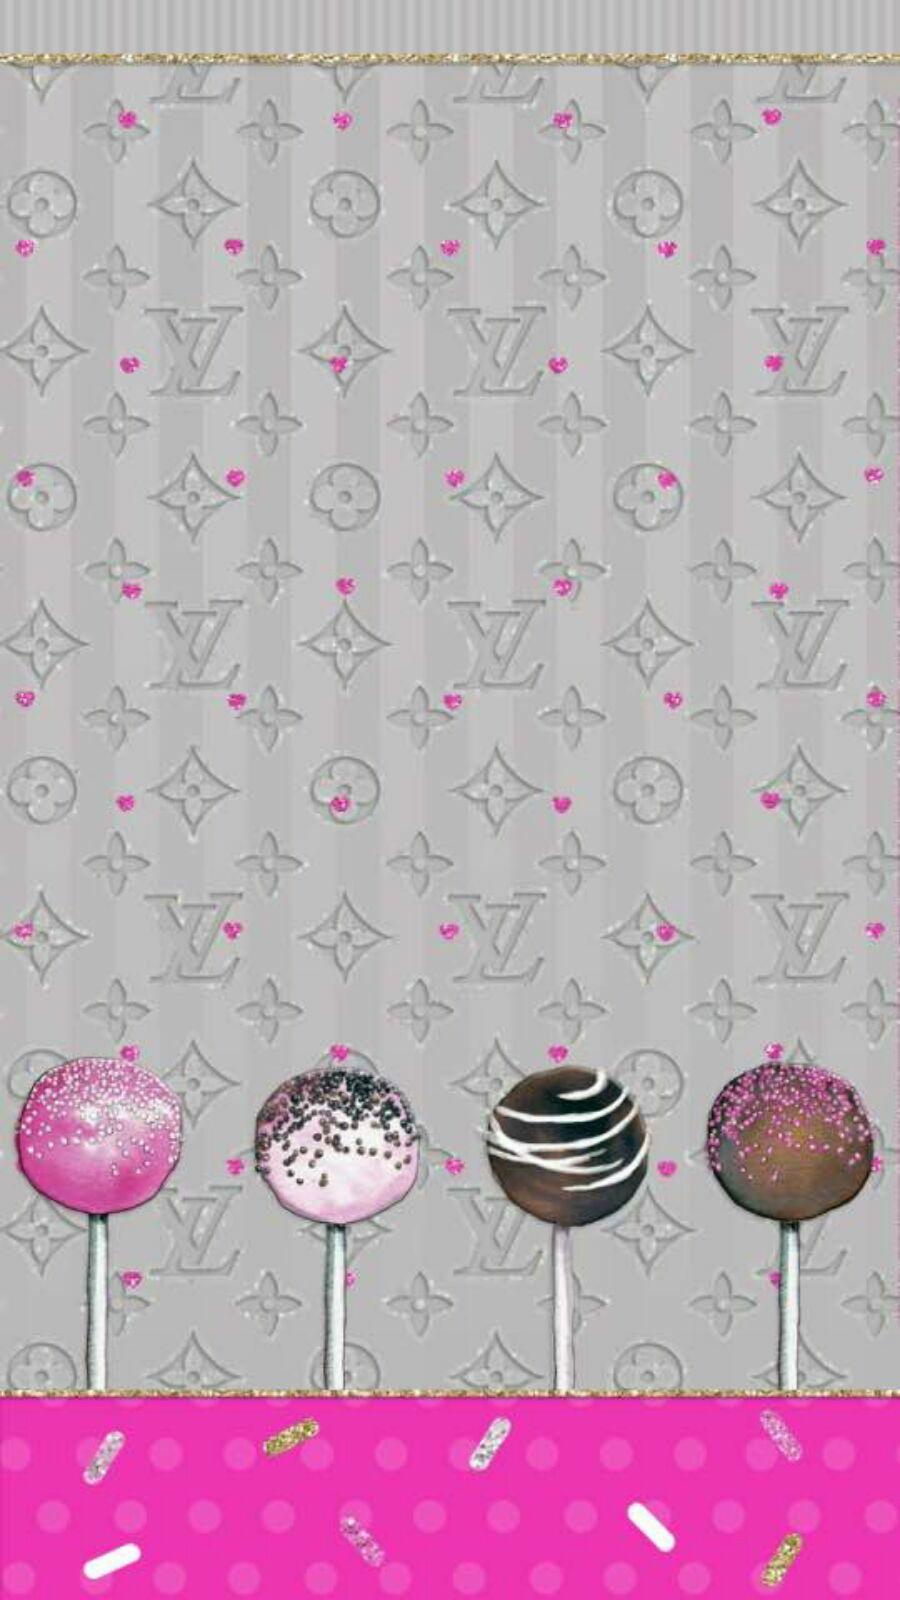 Best Wallpaper Hello Kitty Gray - e14b84077925fa6e9300ac1c4c4ff5d6  You Should Have_73496.jpg